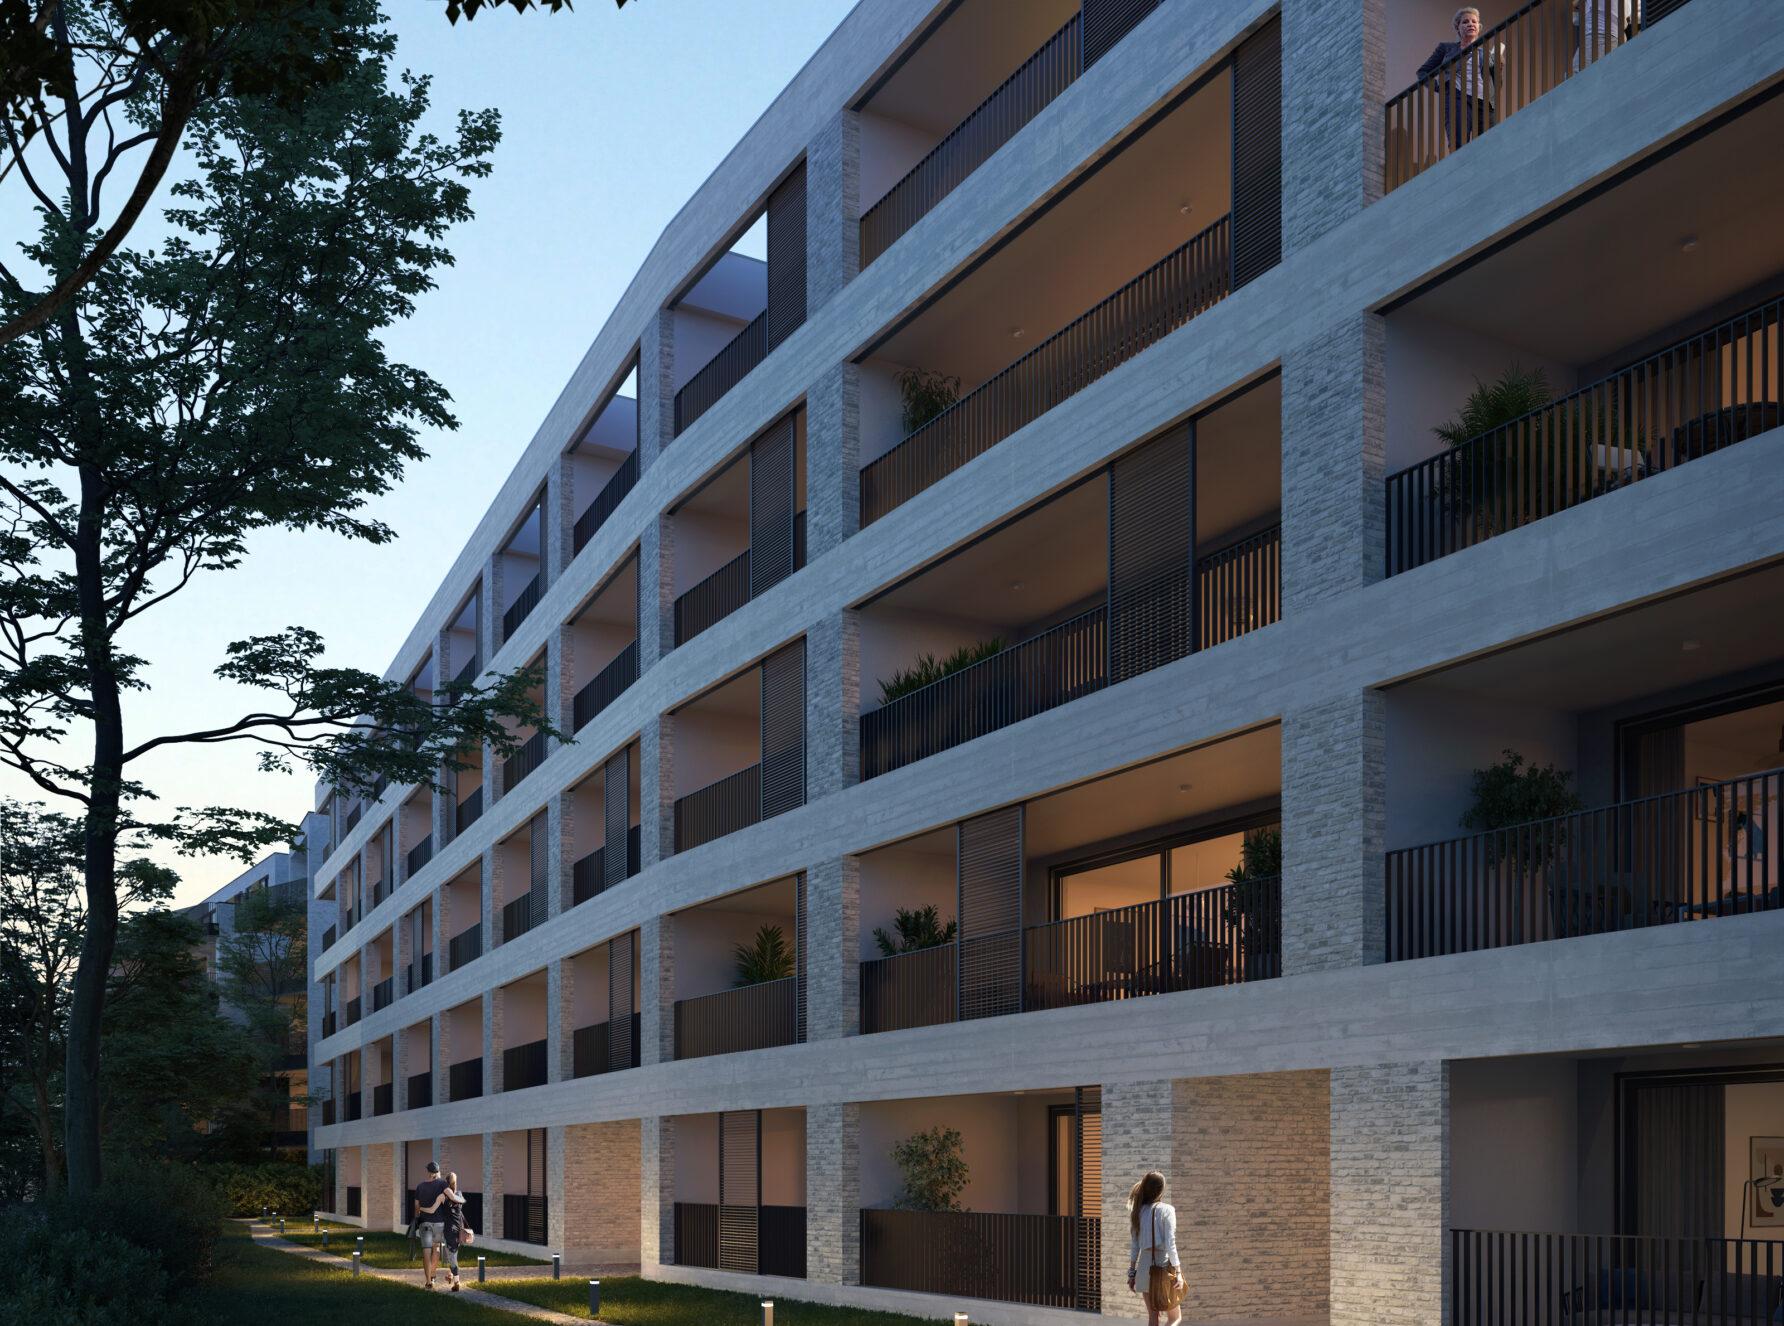 7655 kolmont refuga images exterior A2 City Apartment final